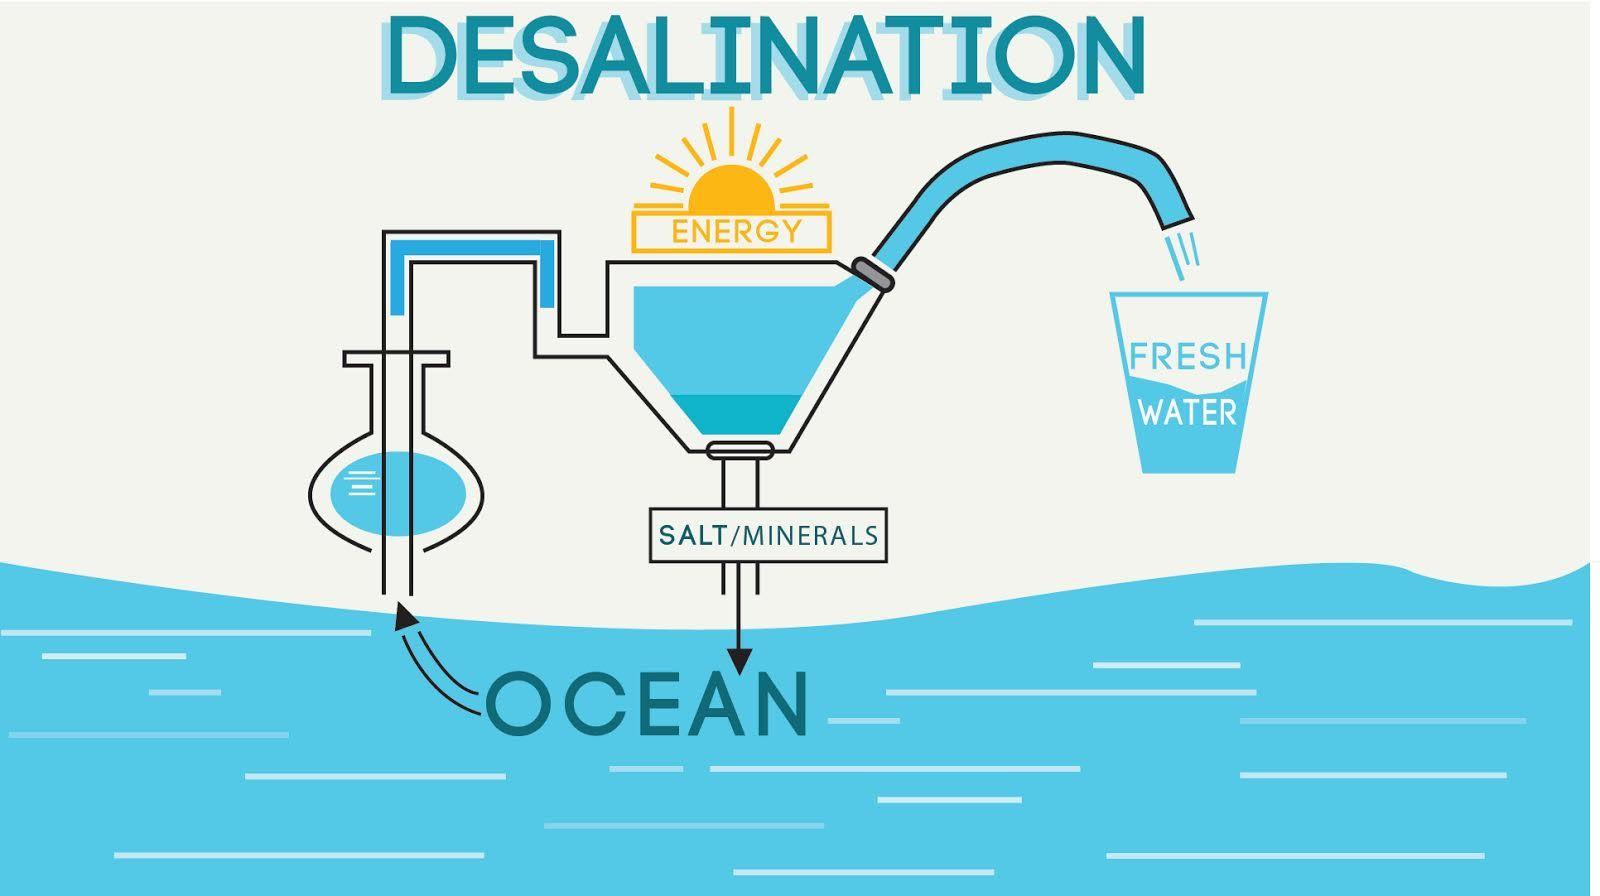 future desalinization - - Yahoo Image Search Results